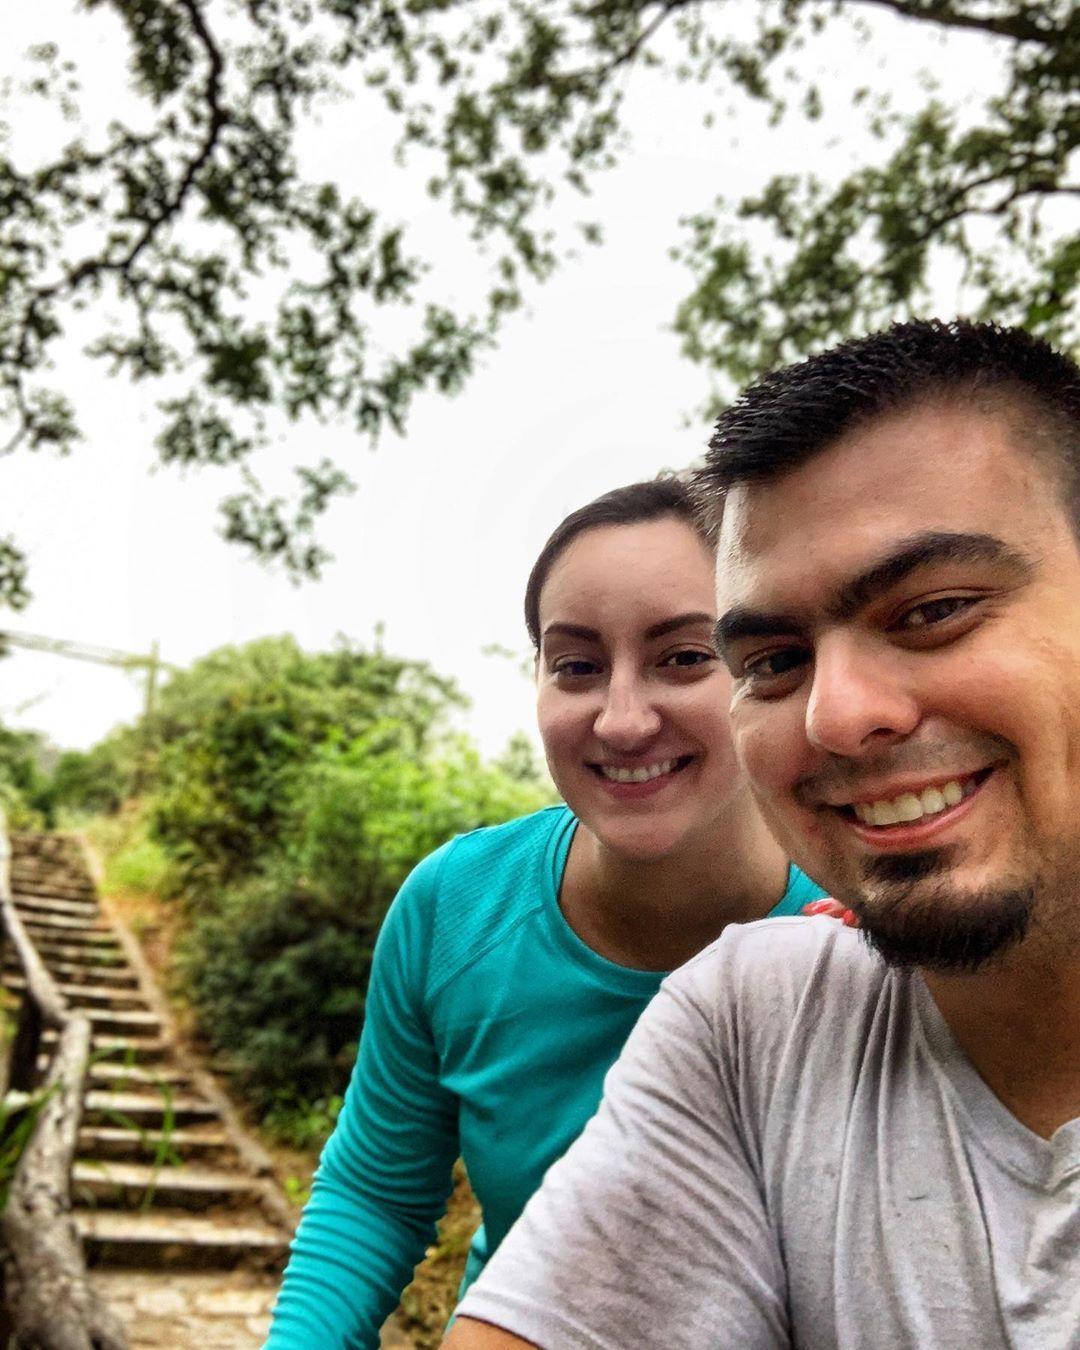 I definitely need to remember to take more pics of ourselves . Got a total of maybe 2 .  . . . . . #visittexas #texastodo #hikingtexas #txstateparks #ig #camptexas #landscapephotography #adventure #sunset #parksintexas #inspiretexasnow #visitmarathontexas #hiketexas #statepark #traveltexas #nature #landscape #stateparks #farwesttexas #exploretexas #hikingadventures #texasparksandwildlife #hiking #austin #texas🇨🇱 #riogrande #texas #getoutside #texashillcountry #bigbendnationalpark